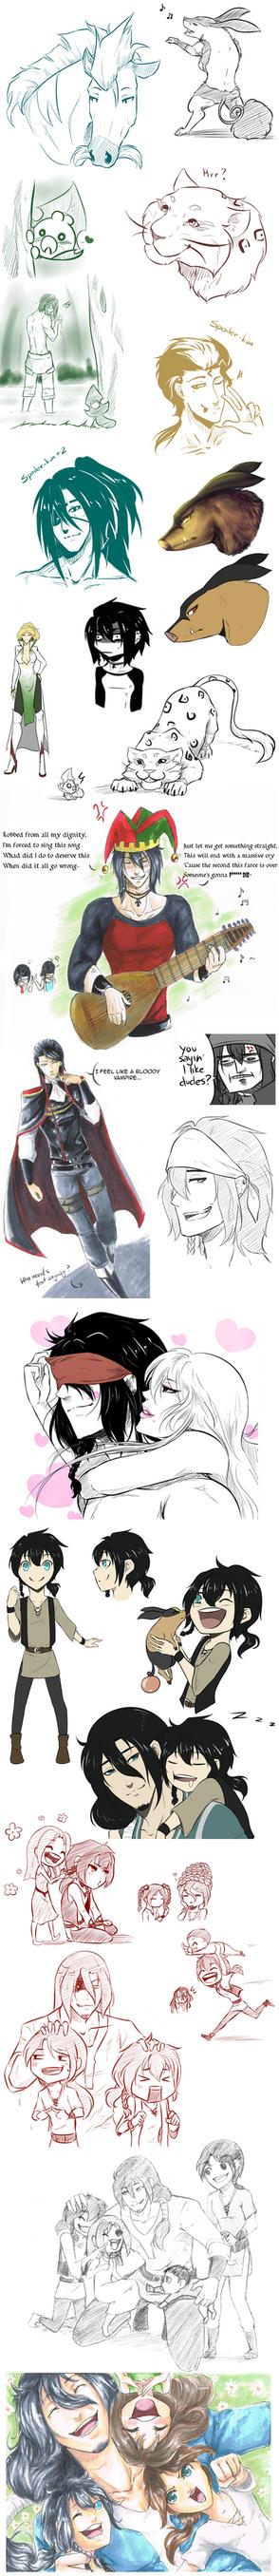 Nuzlocke doodles by Antarija